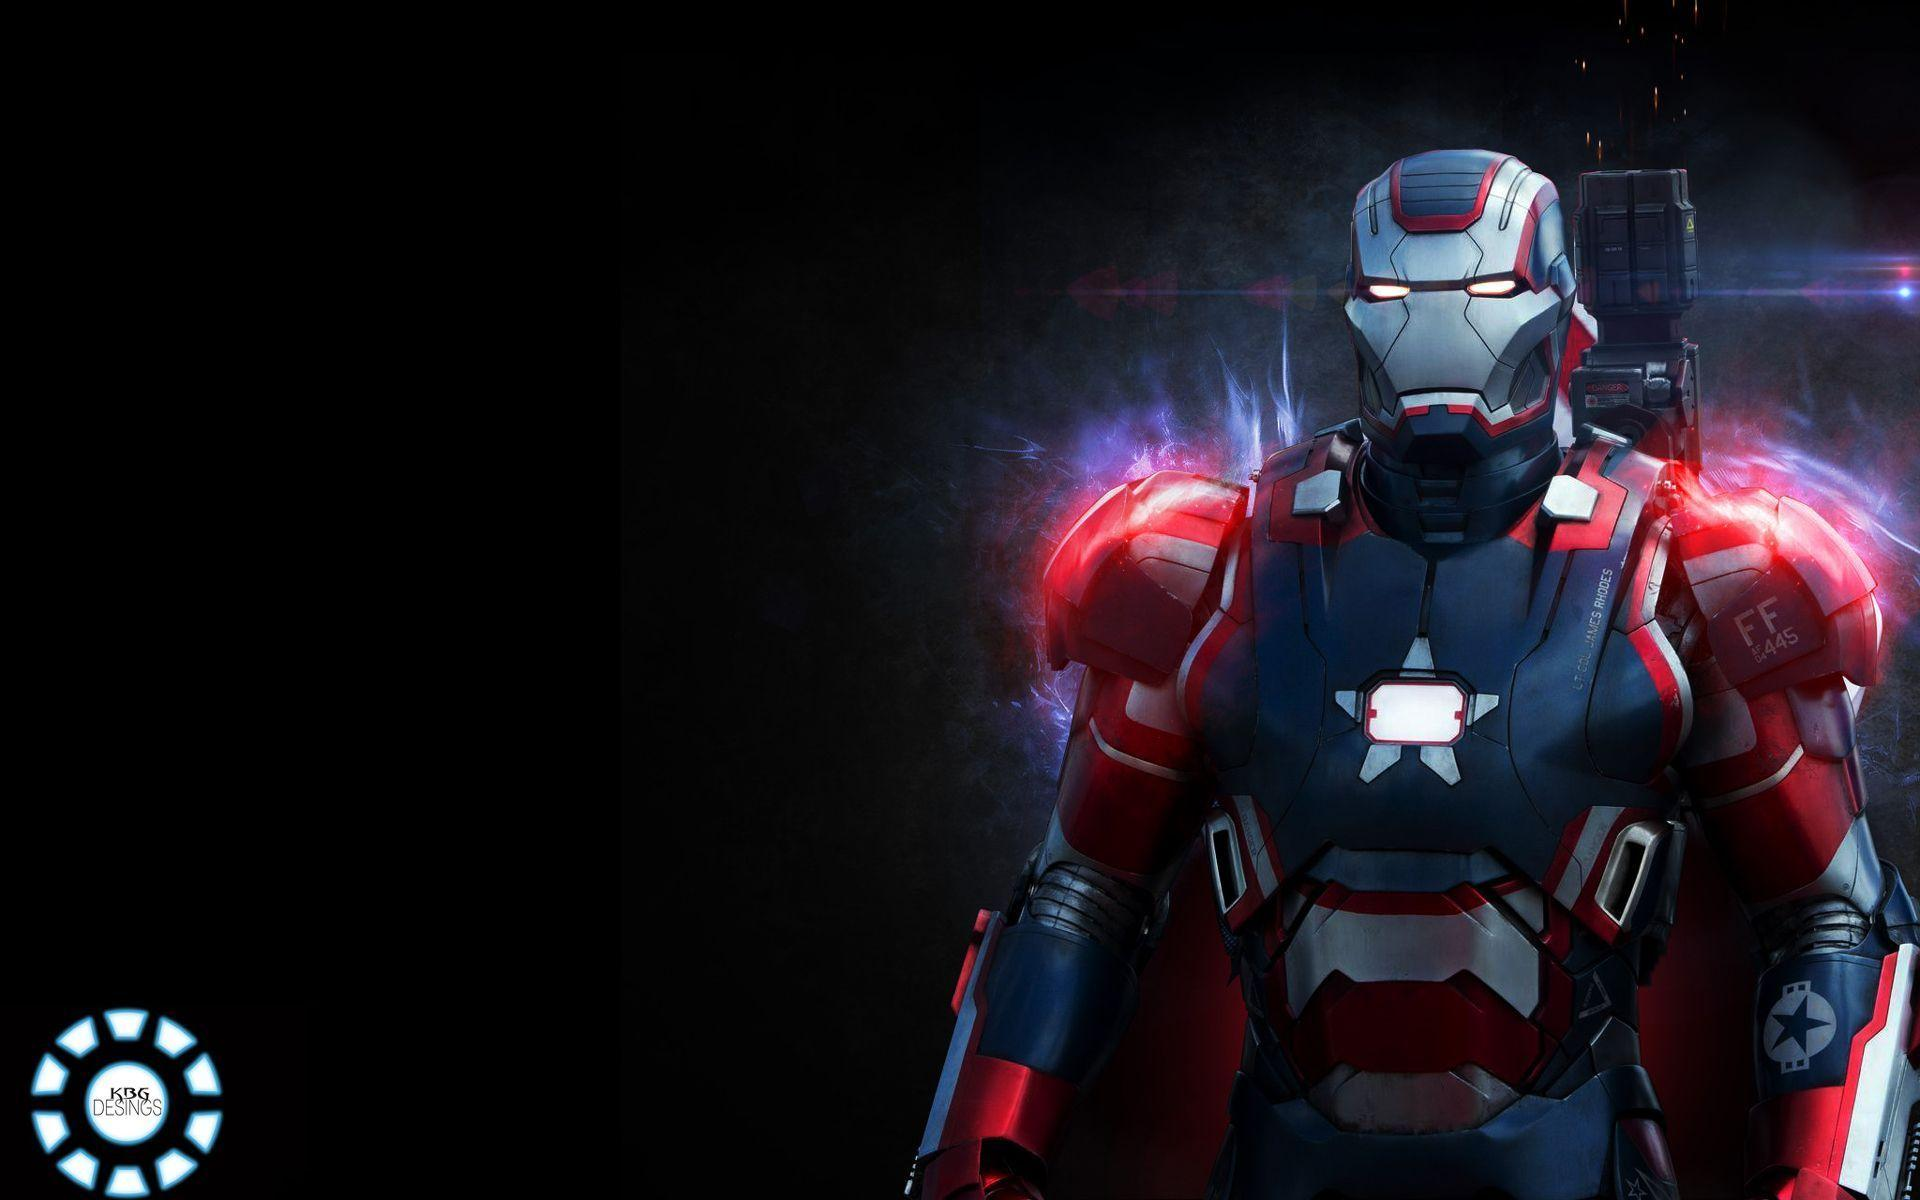 Iron Man Mark 50 Wallpapers - Wallpaper Cave  Iron Man Mark 5...